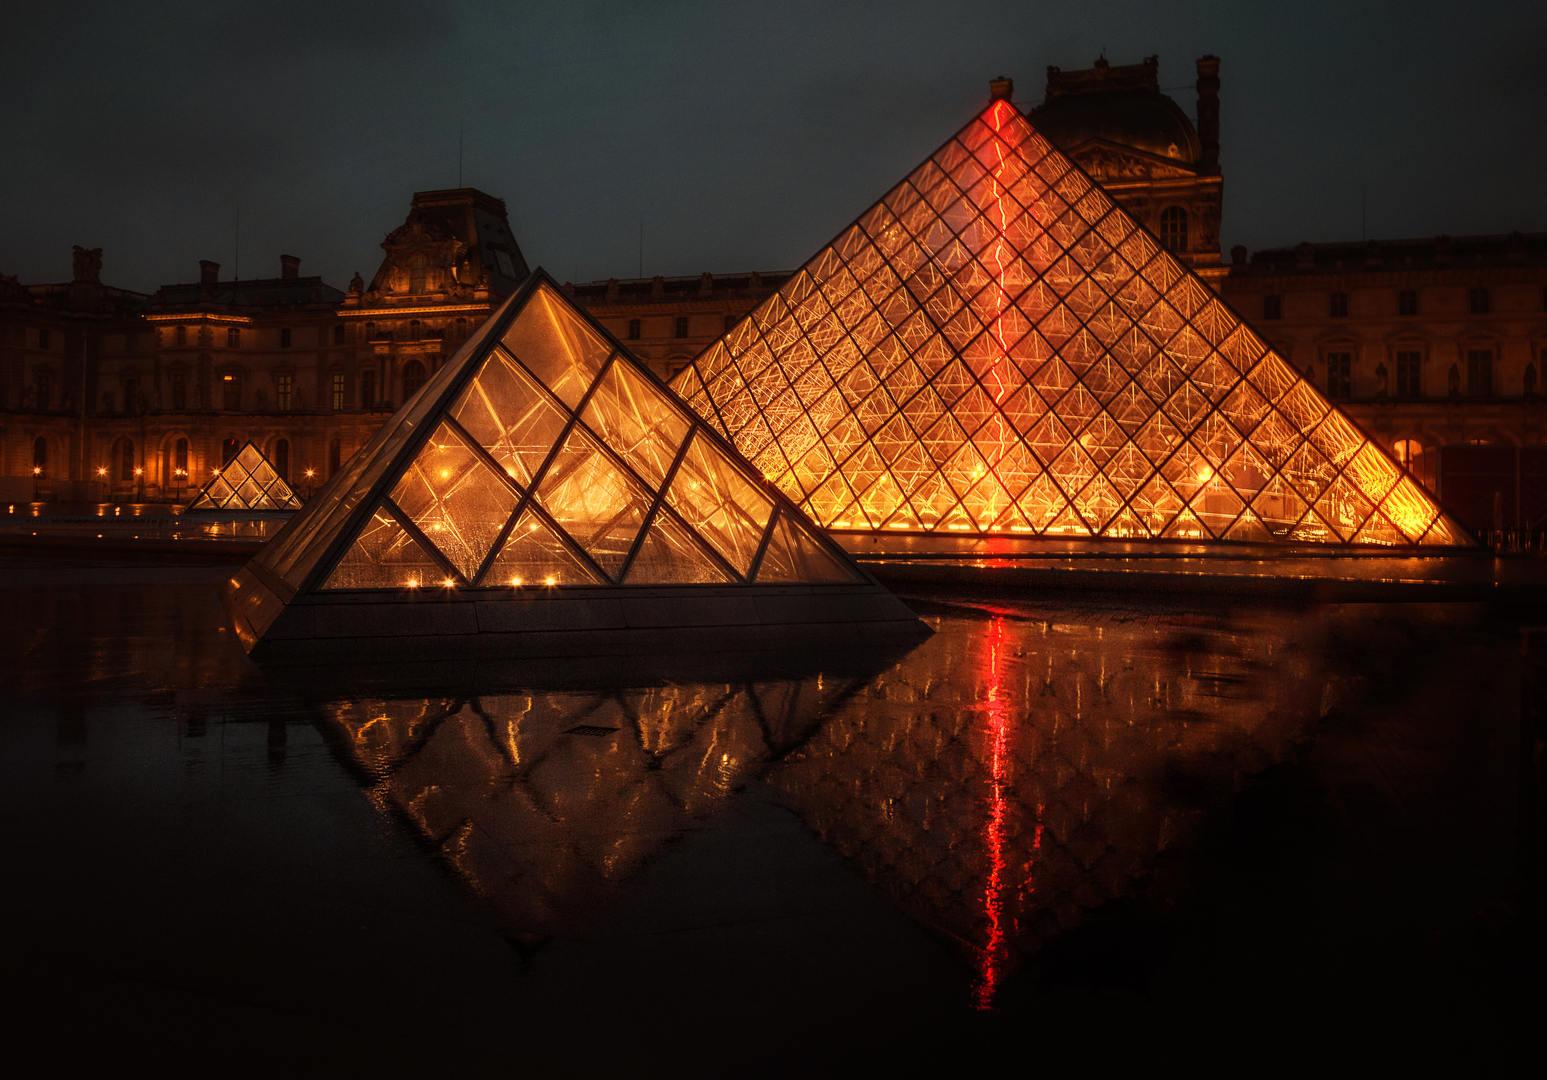 The Paris jewels